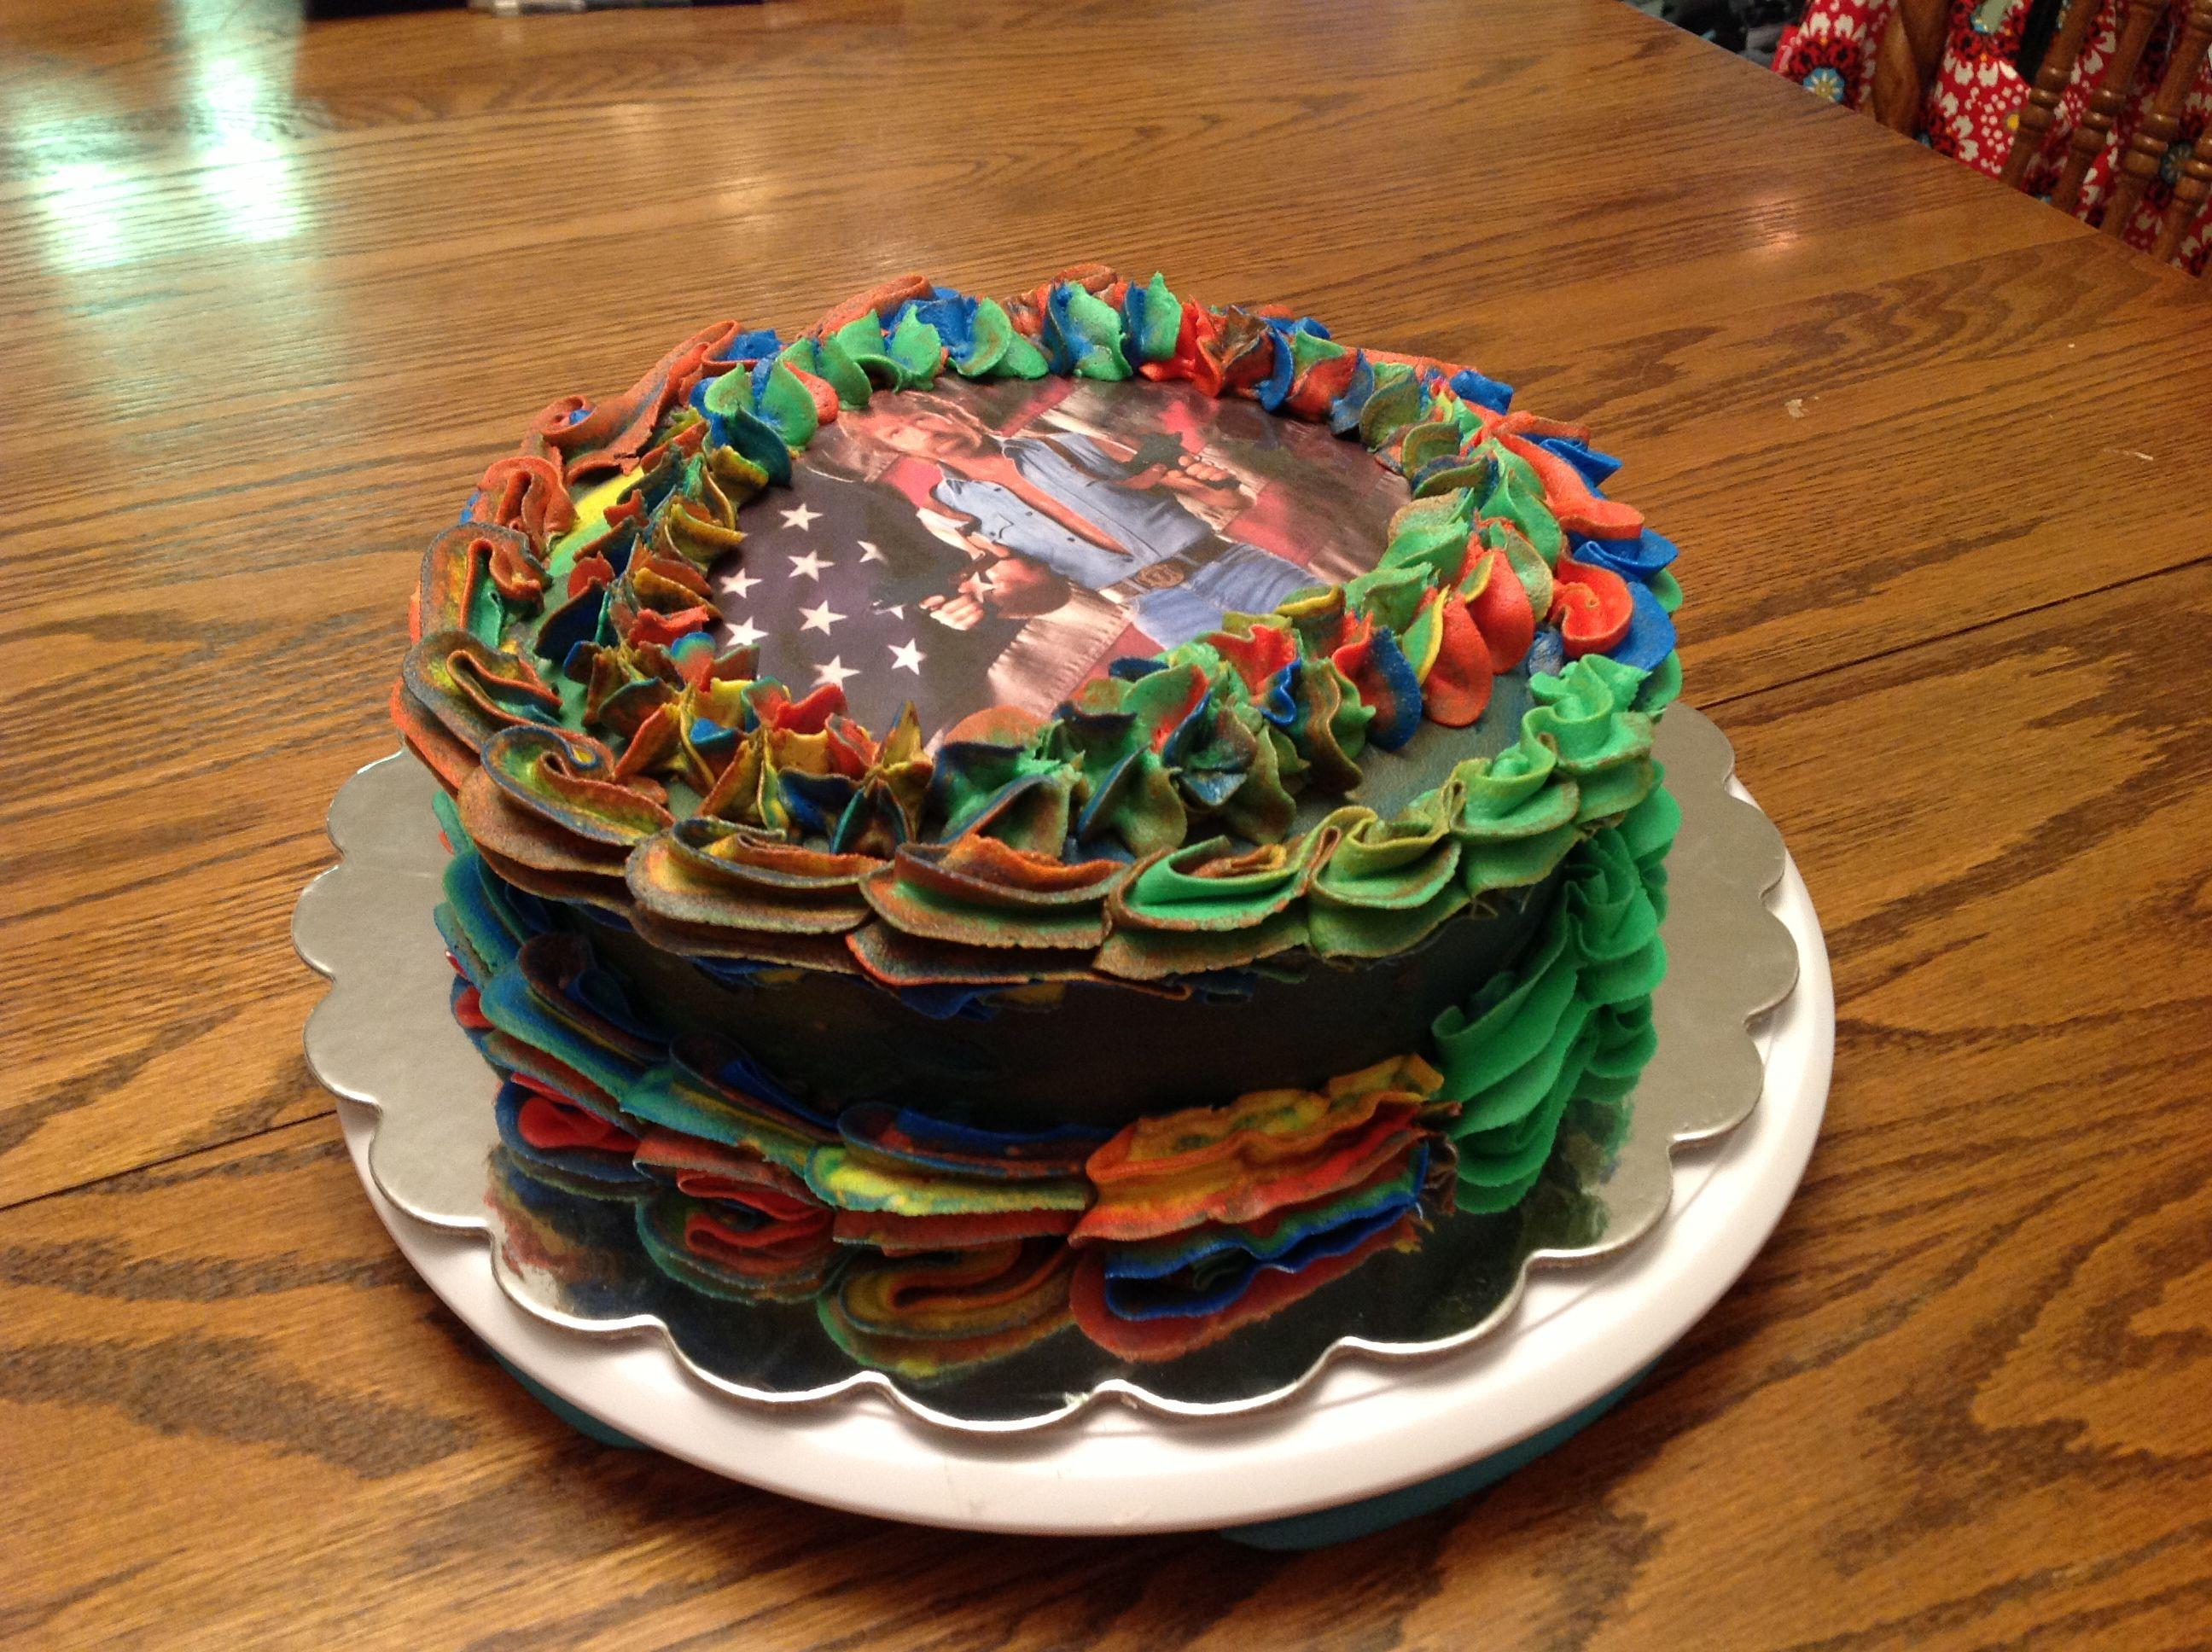 Admirable Chuck Norris Cake Cake Desserts Bakery Personalised Birthday Cards Sponlily Jamesorg